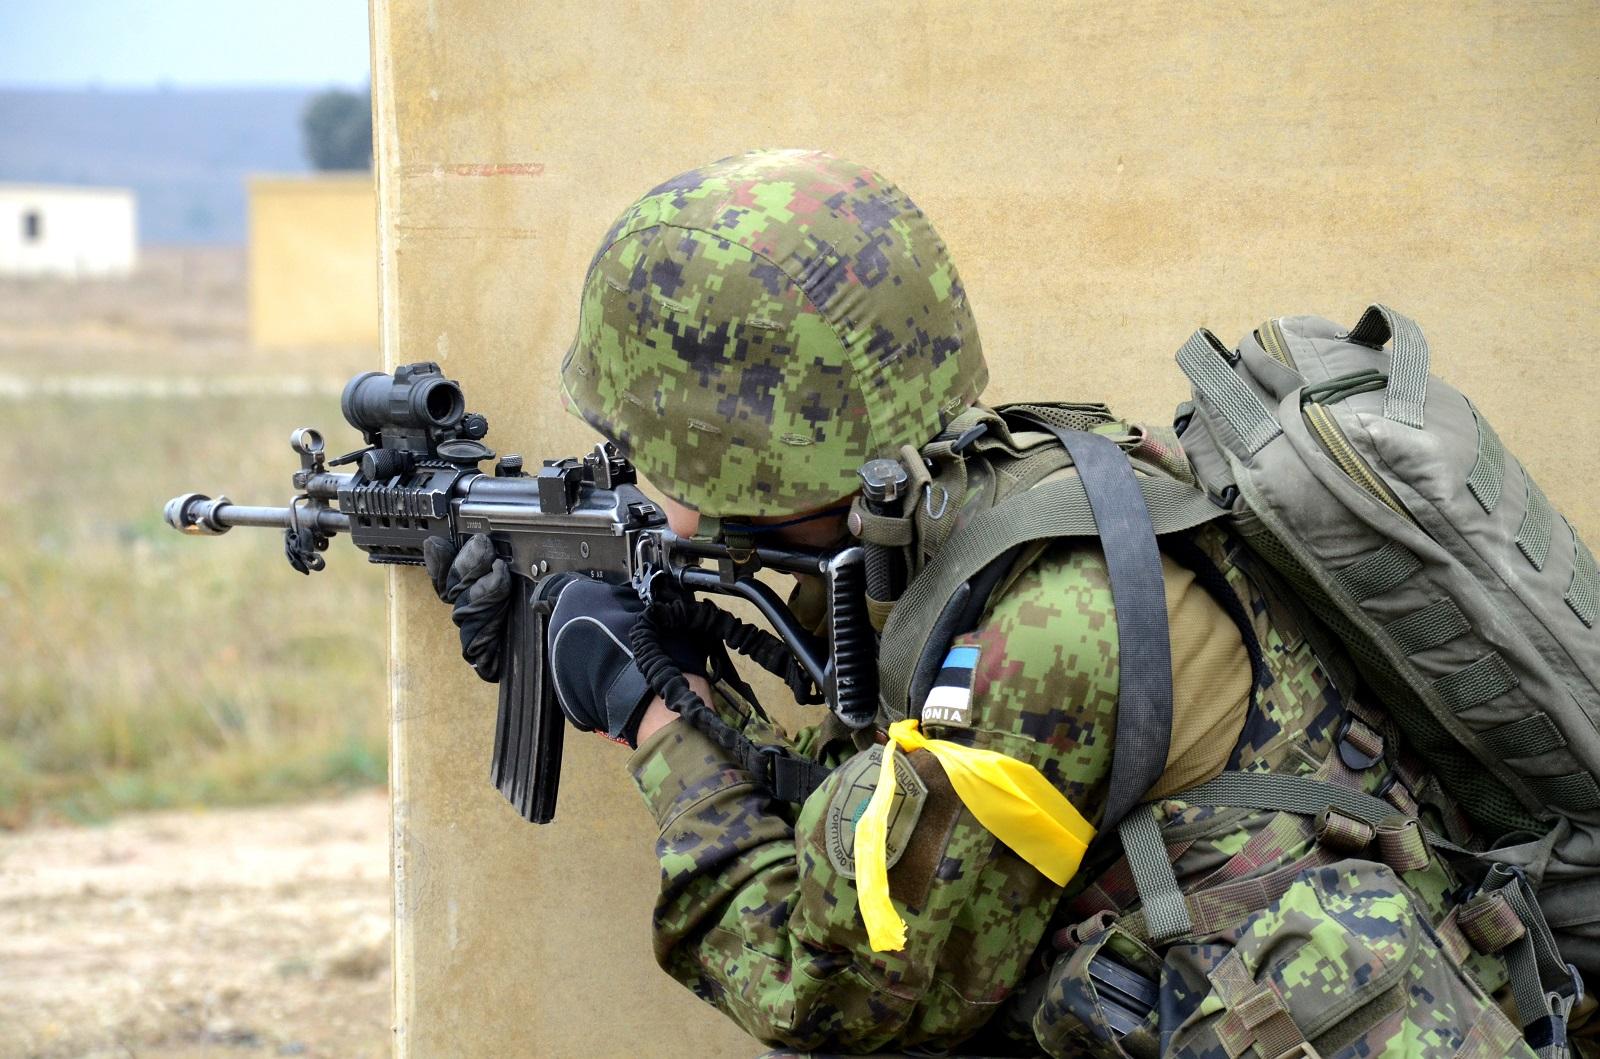 meet the galil assault rifle  israel u0026 39 s very own  u0026 39 ak